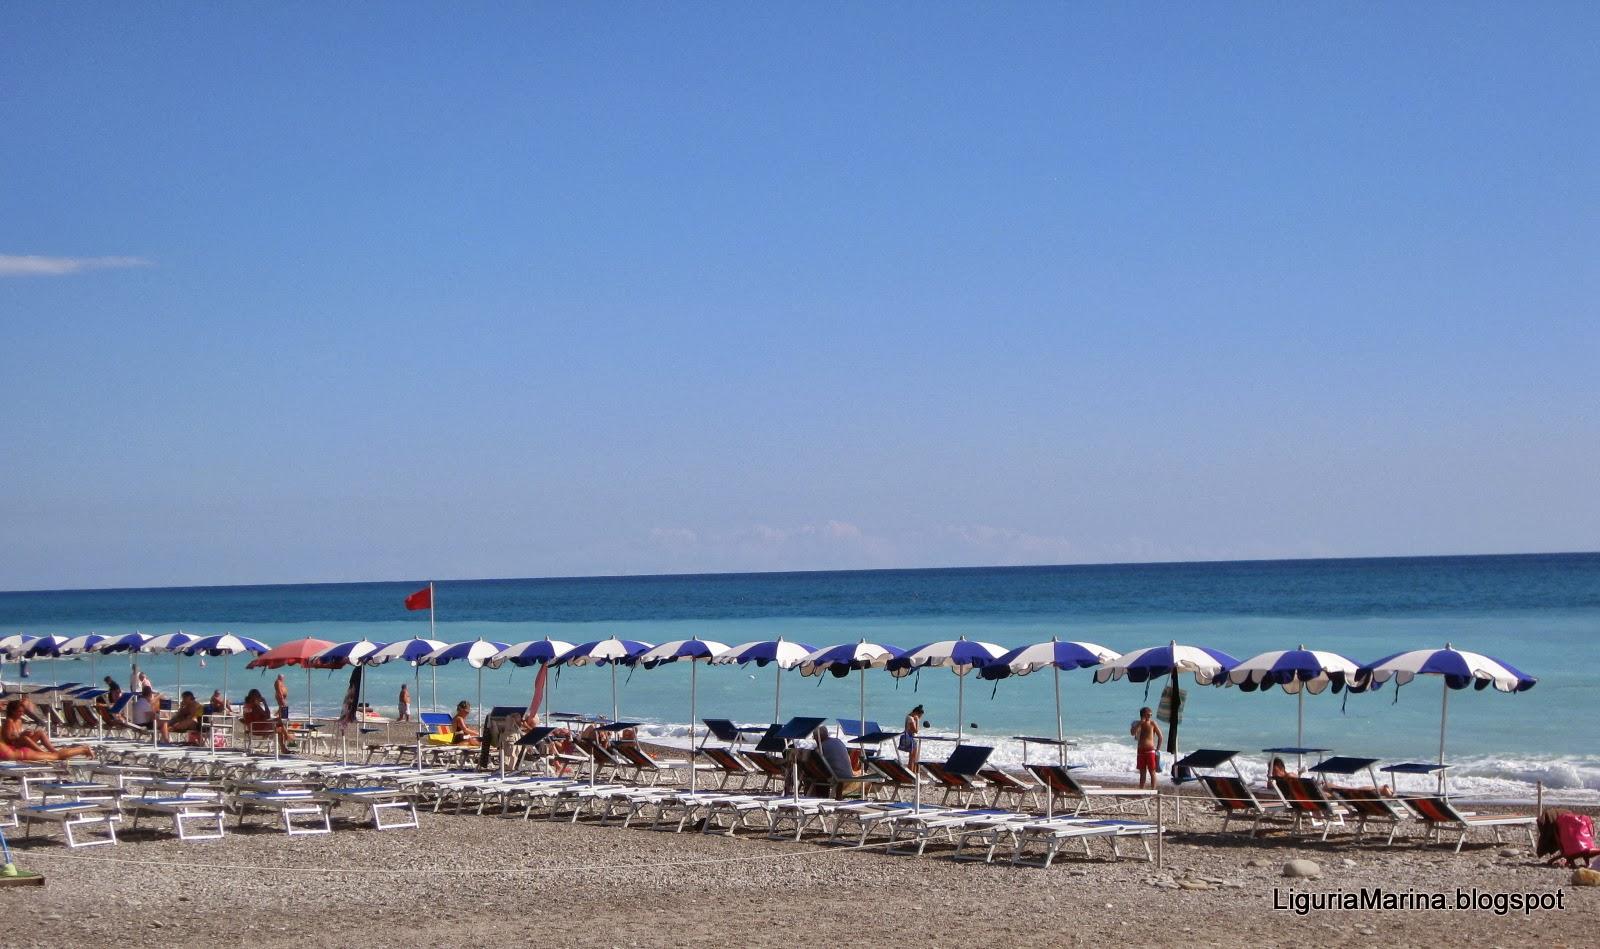 LiguriaMarina Bordighera